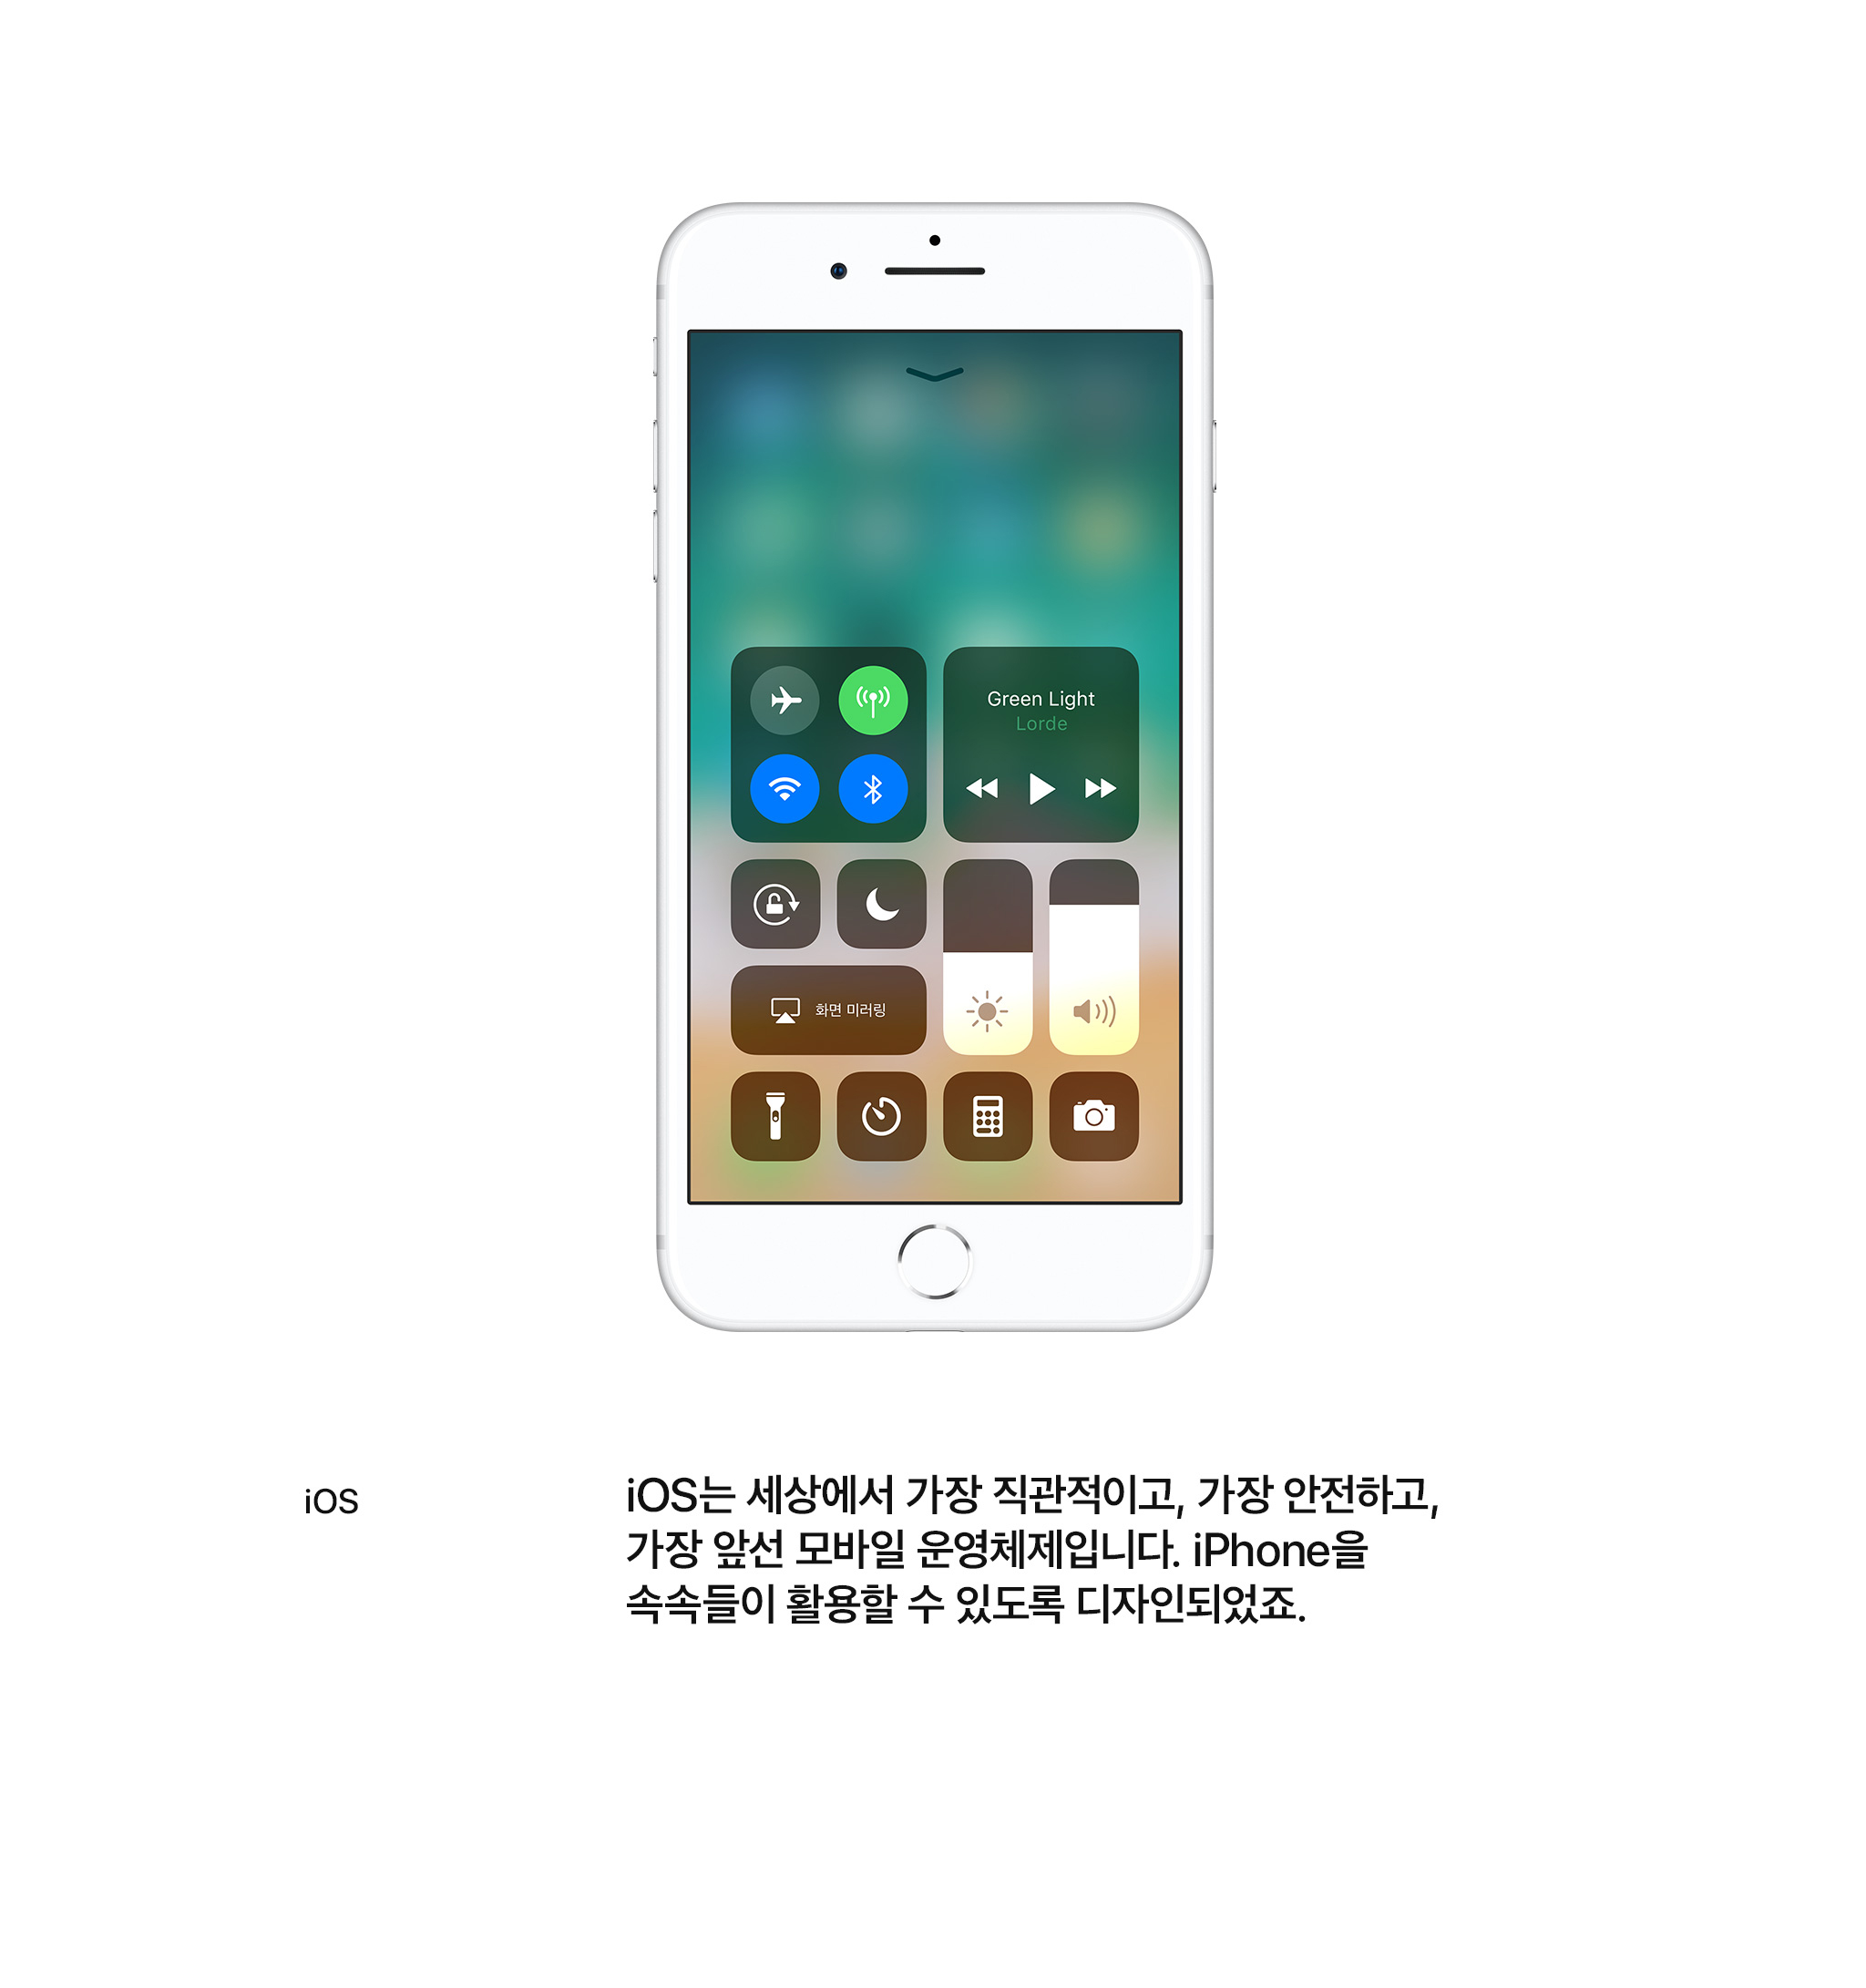 iOS iOS는 세상에서 가장 직관적이고, 가장 안전하고, 가장 앞선 모바일 운영체제입니다. iPhone을 속속들이 활용할 수 있도록 디자인되었죠.